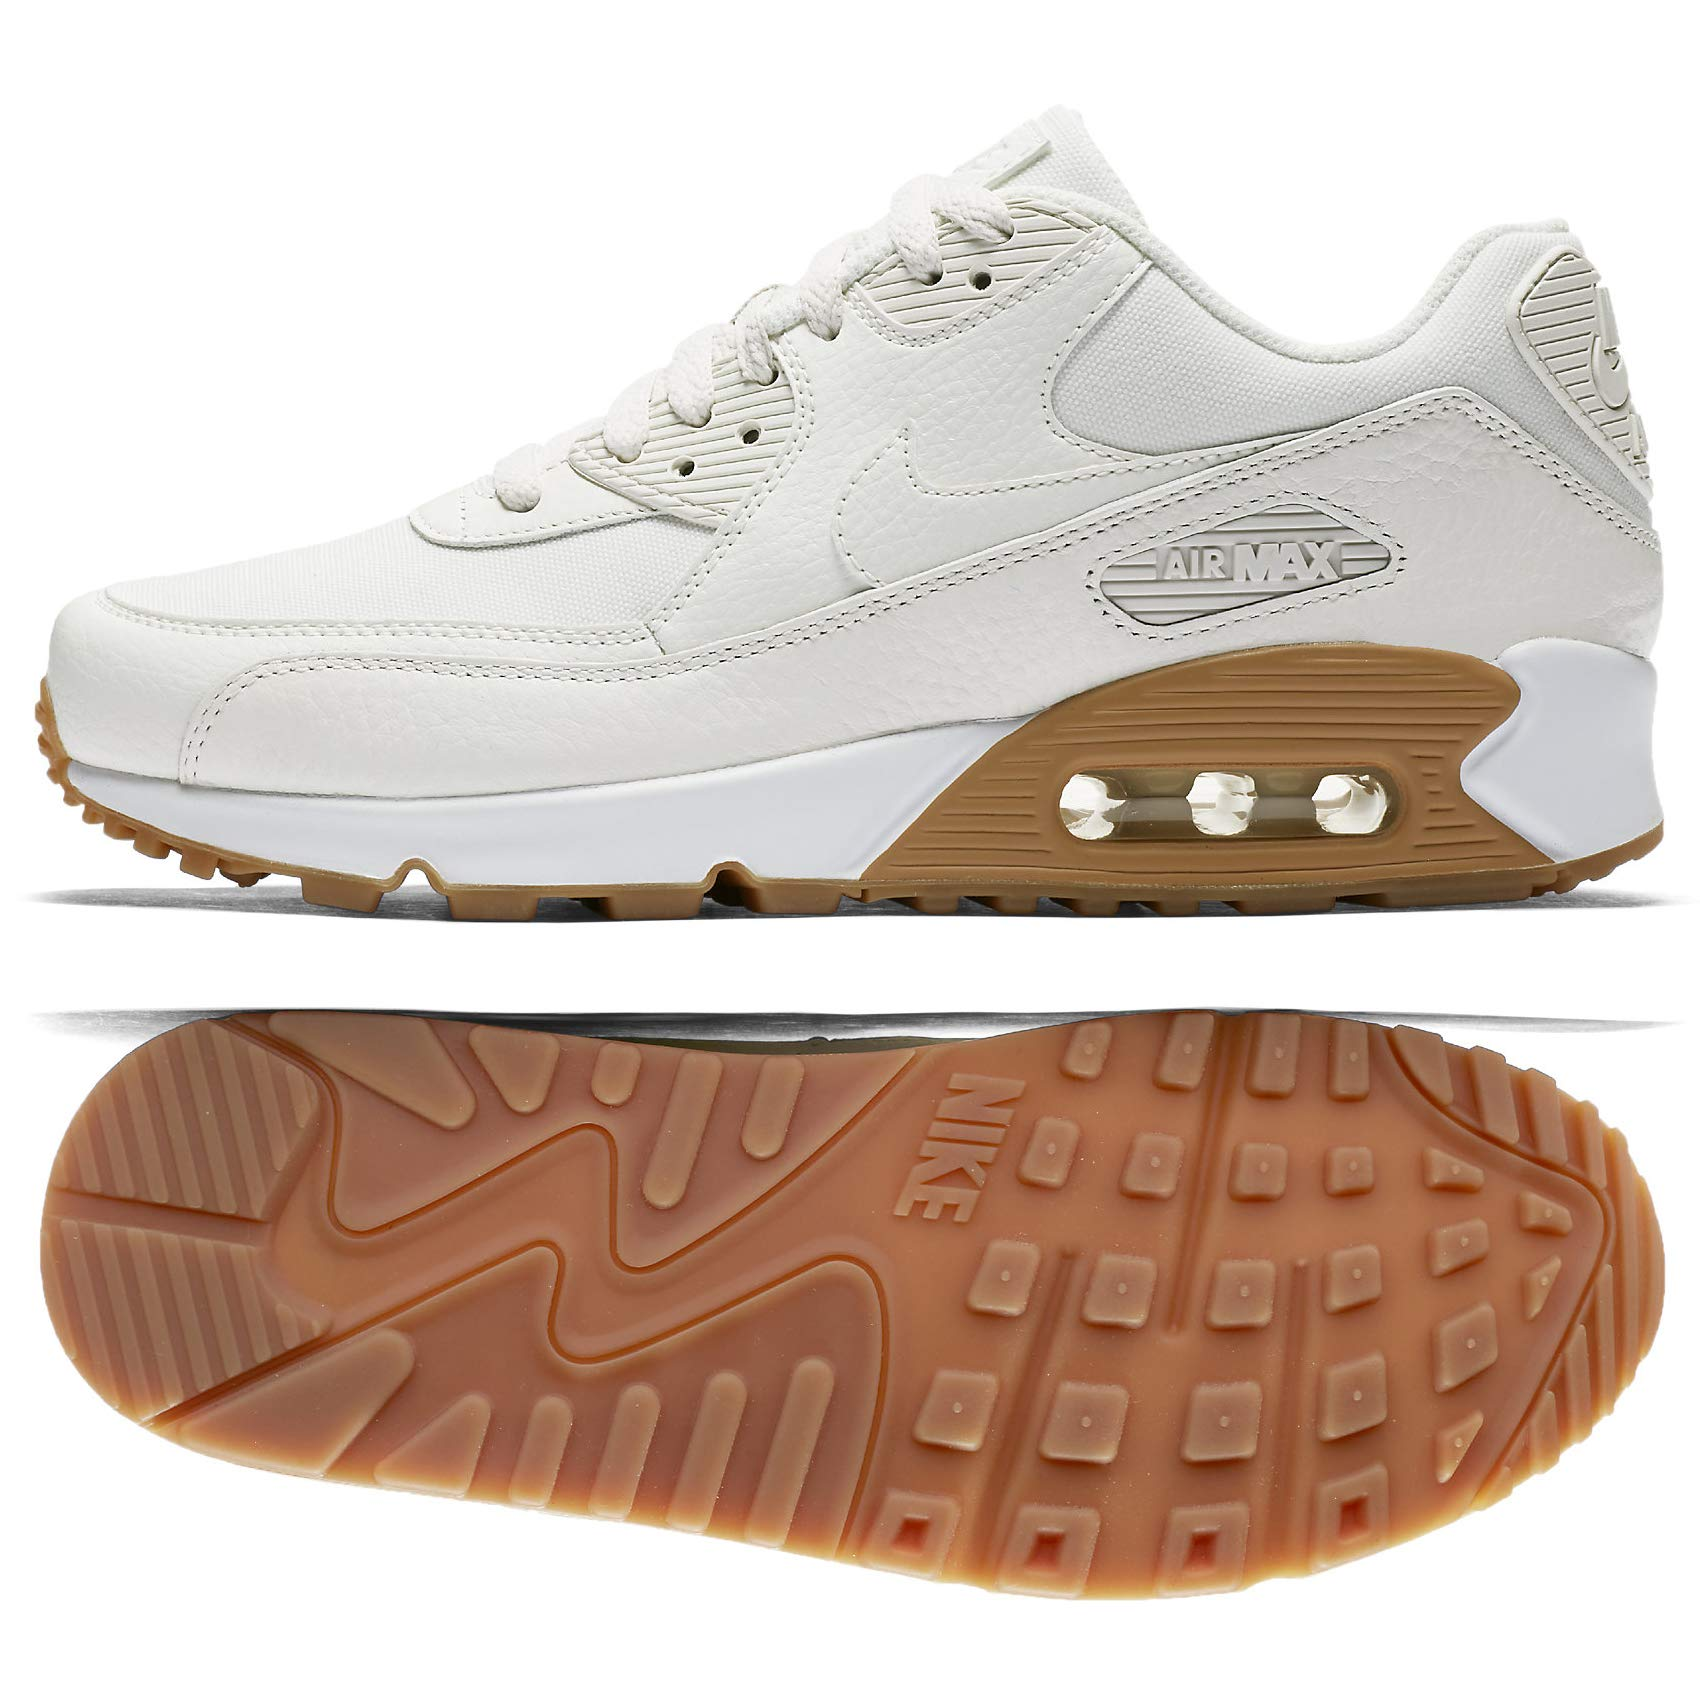 check out 385c5 8da2f Galleon - Nike Air Max 90 Premium Women s Running Shoes 896497-100 (9)